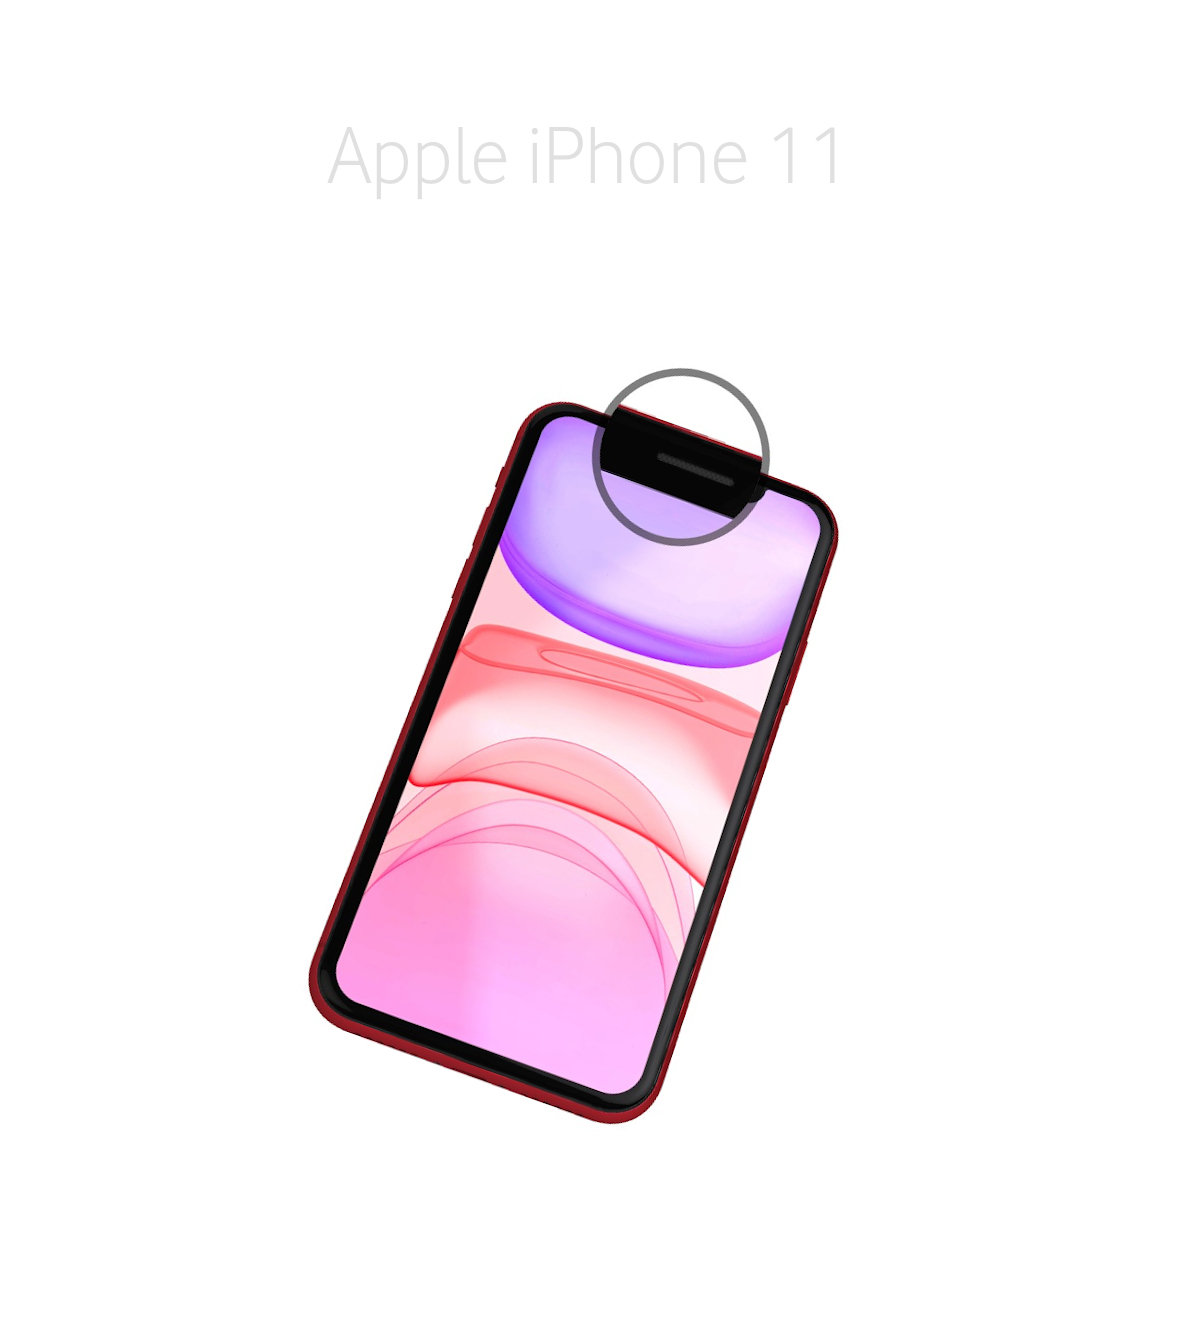 Laga samtalshögtalare iPhone 11